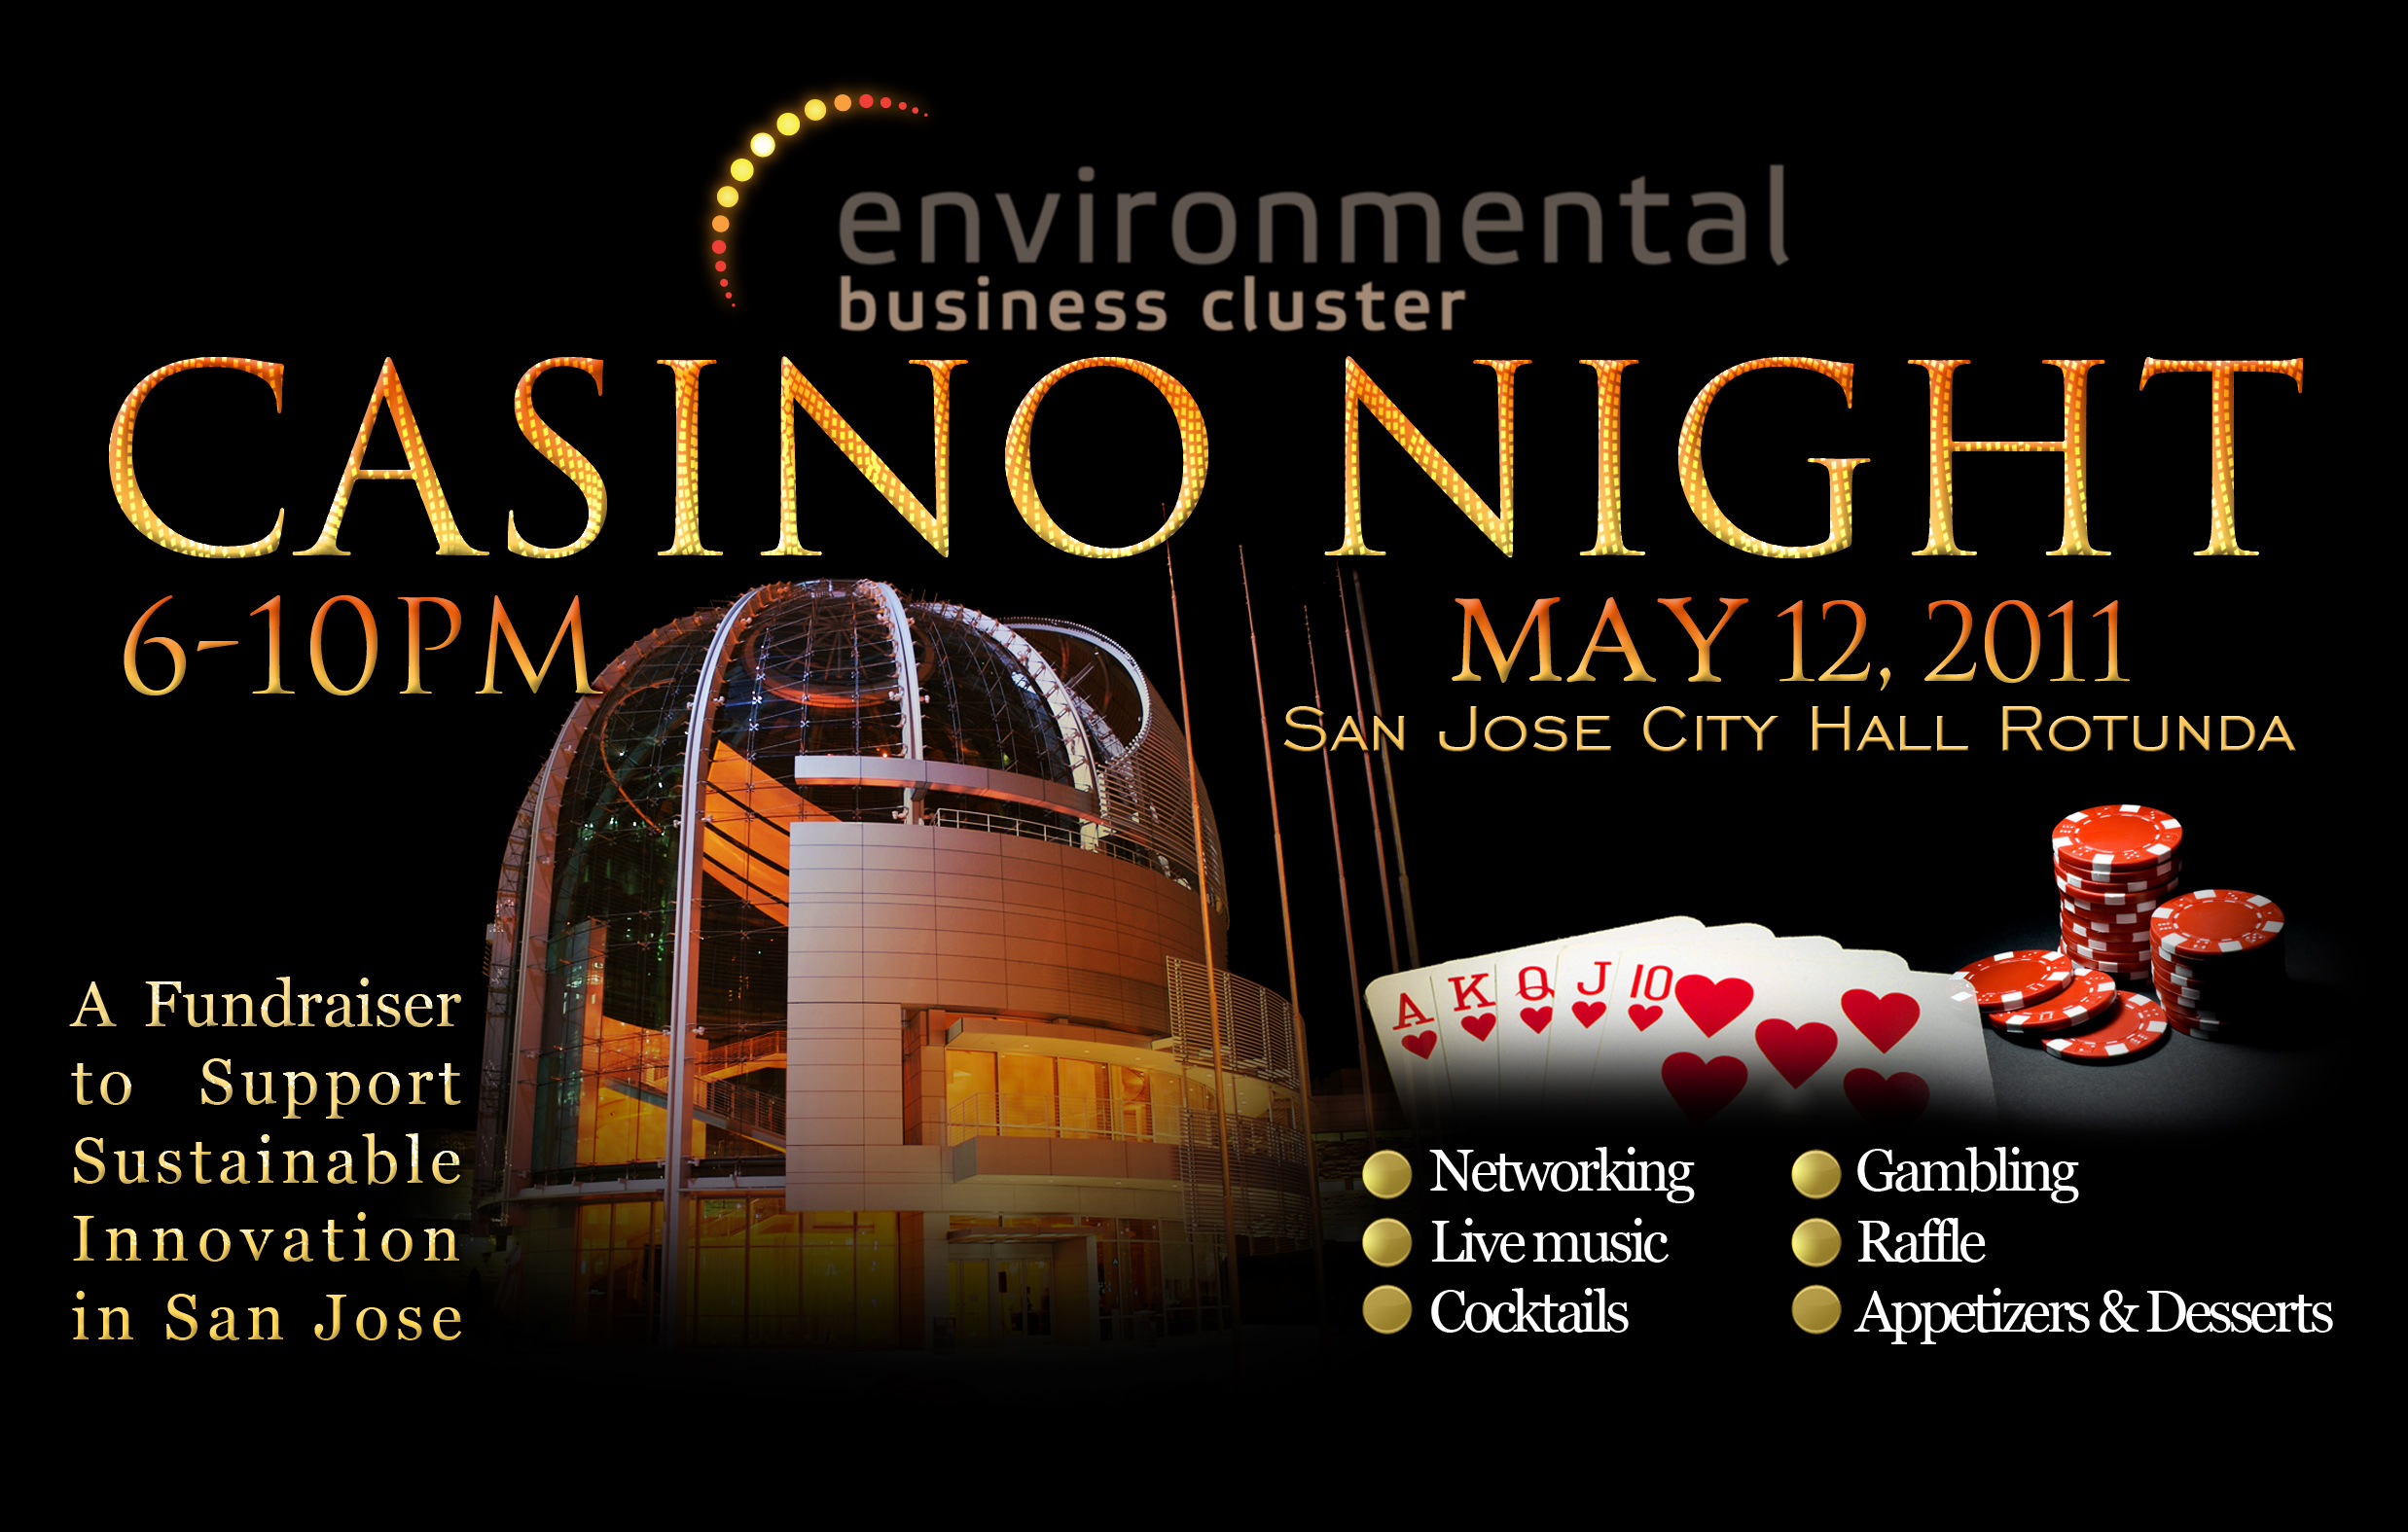 cleantech networking fundraiser Casino Night